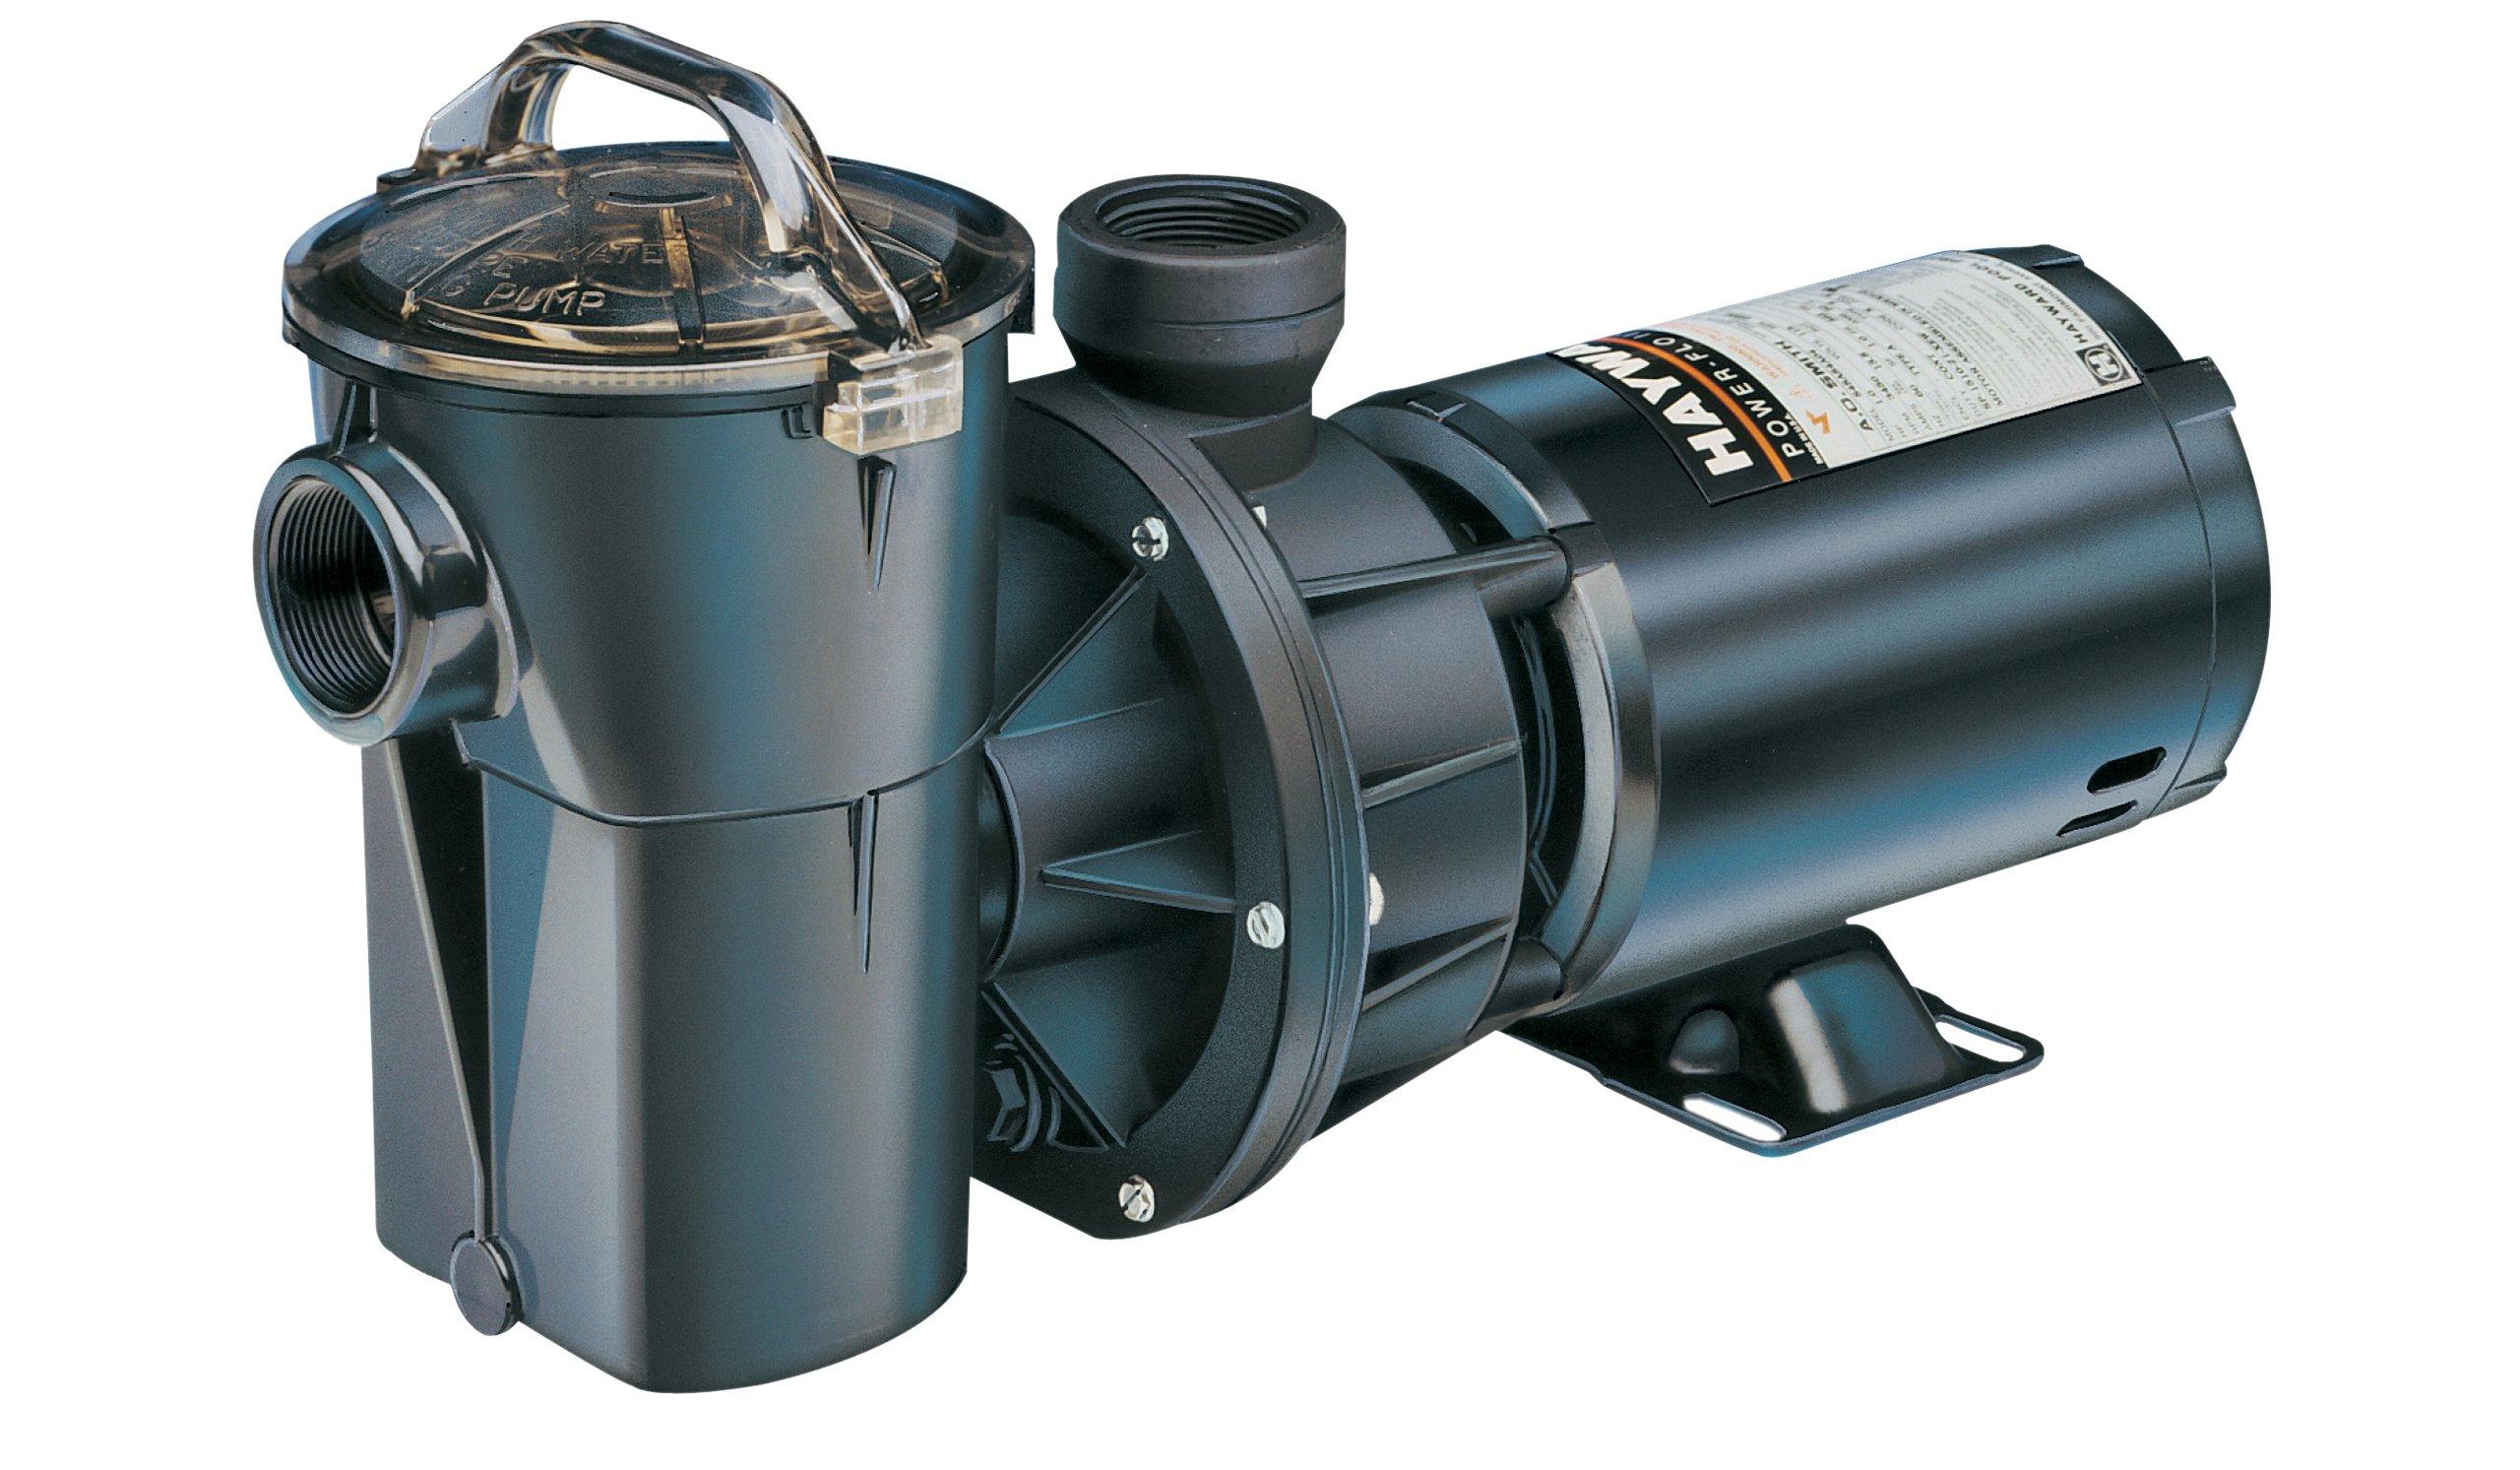 Hayward SP1540C PowerFlo 40 GPM Above-Ground Swimming Pool Pump